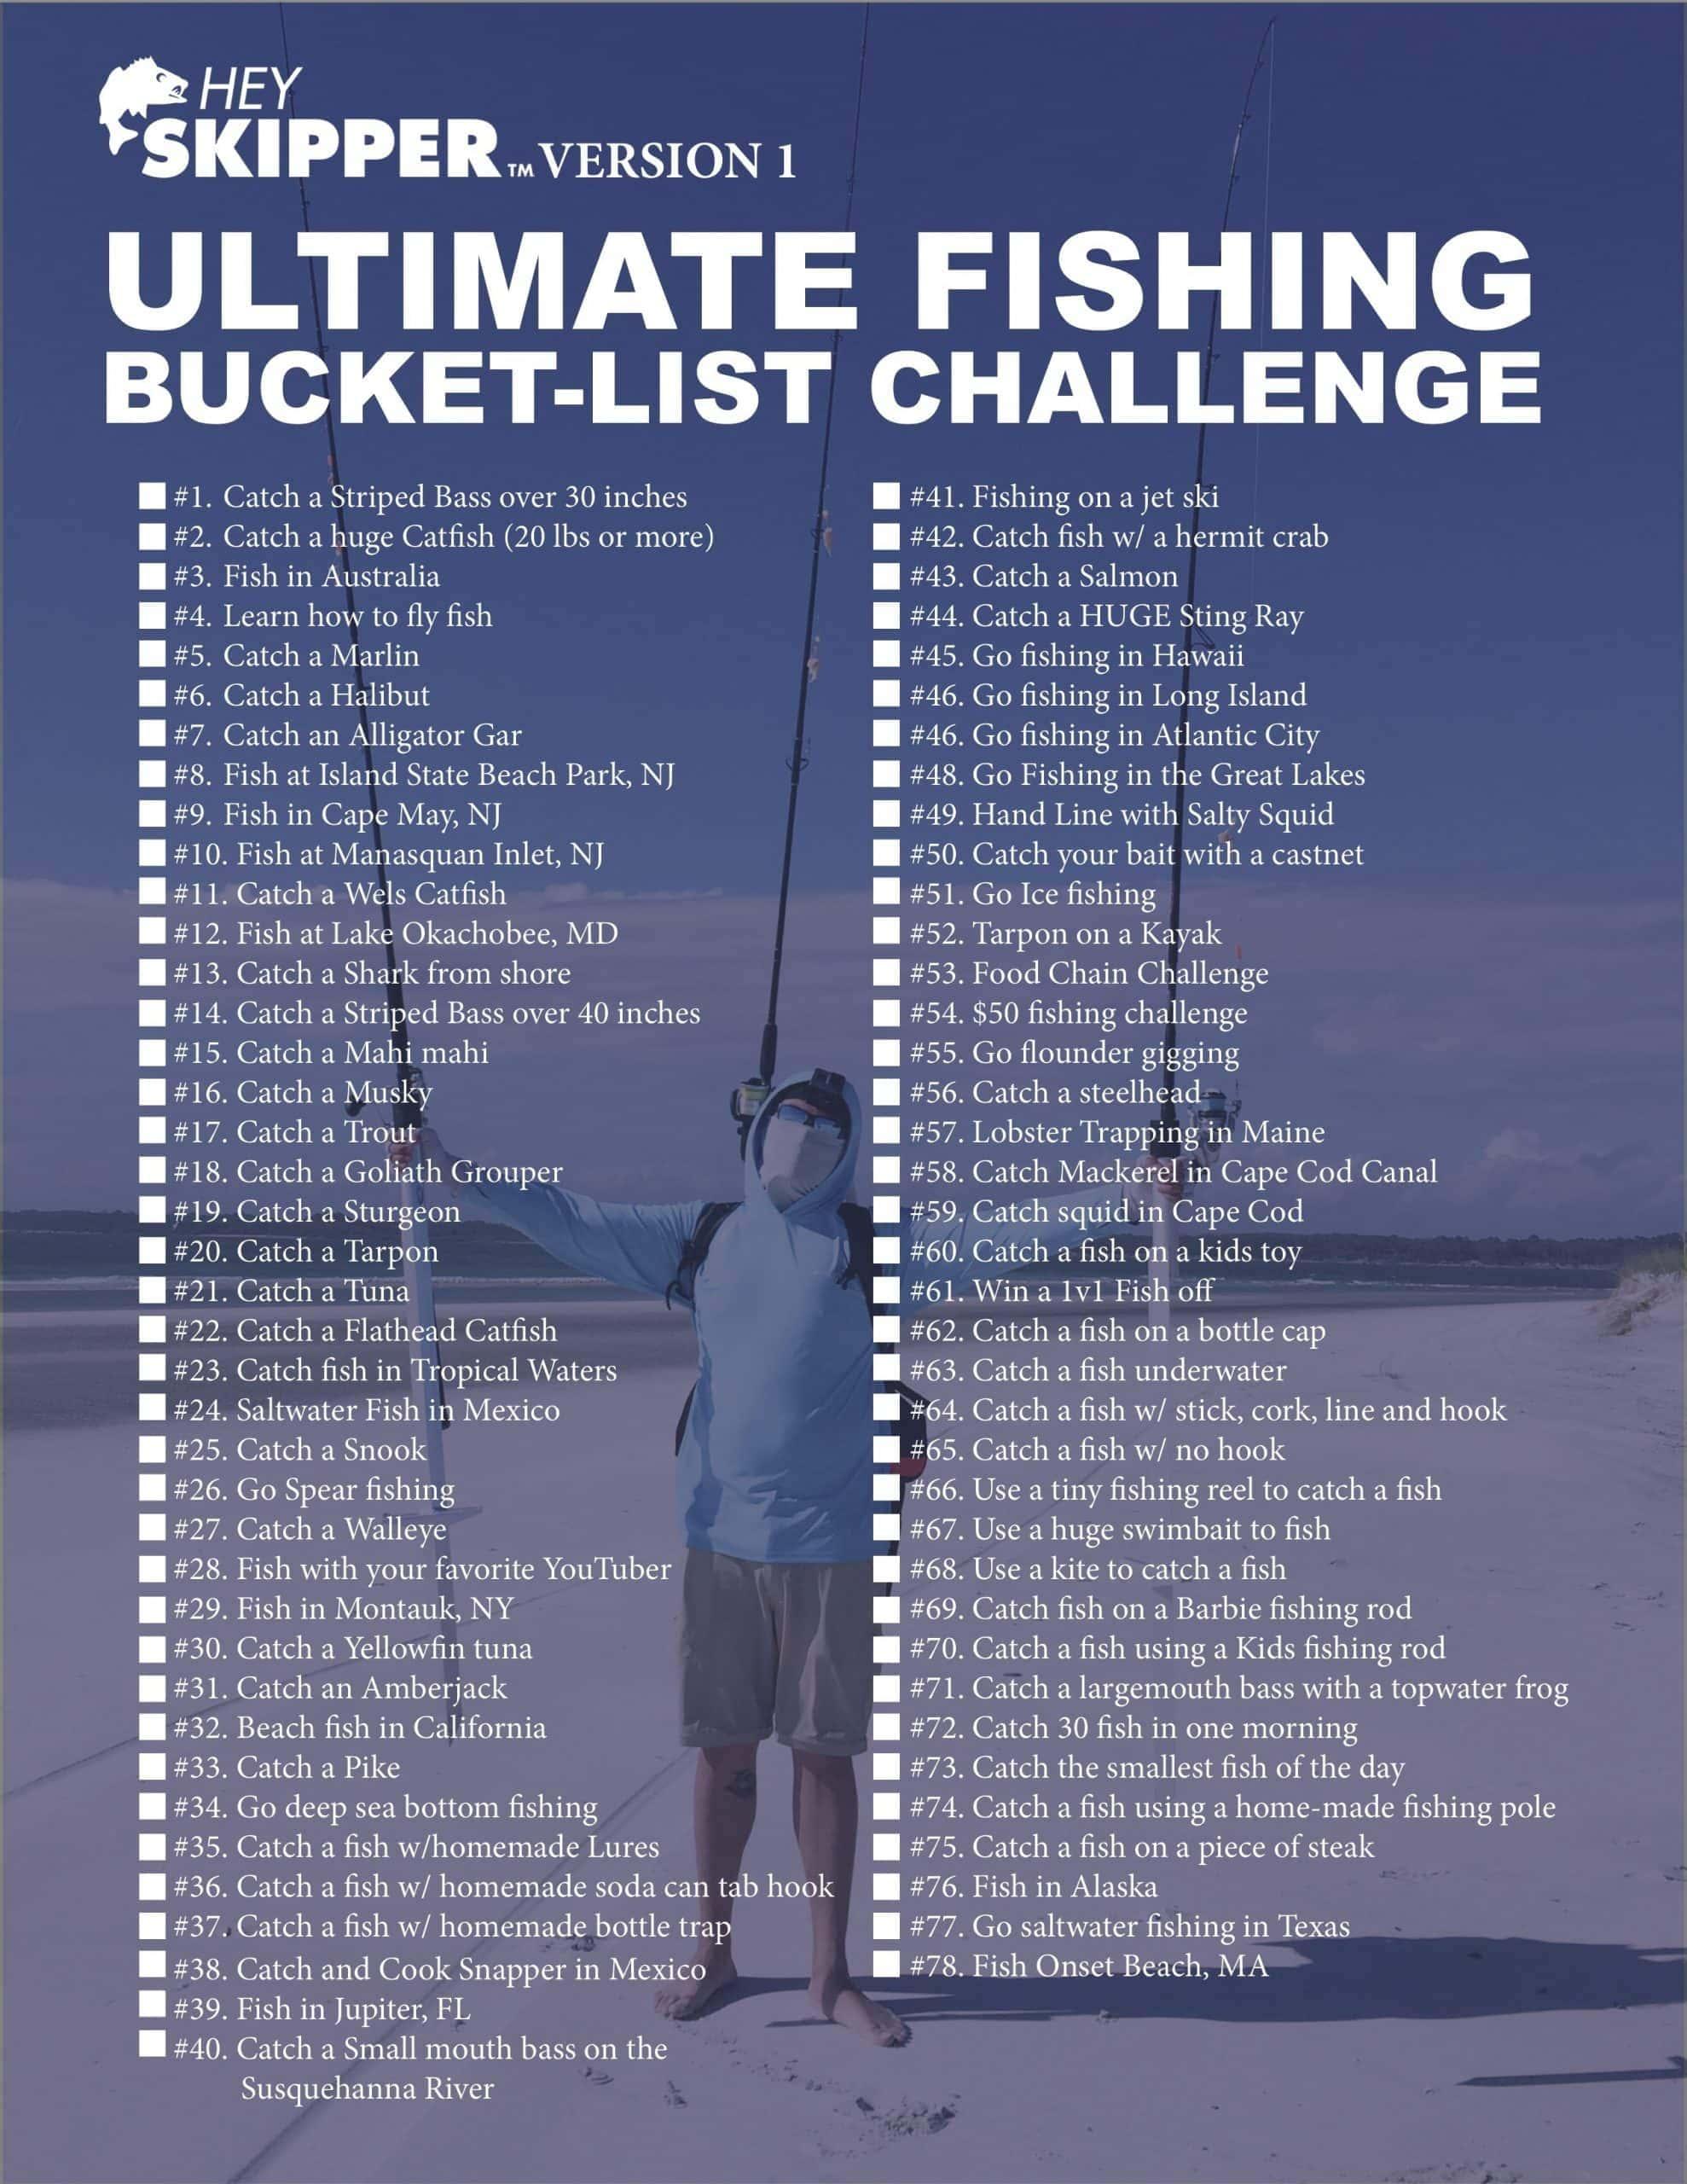 Hey Skipper Fishing Tutorials Ultimate Fishing Bucket-List Challenge v1